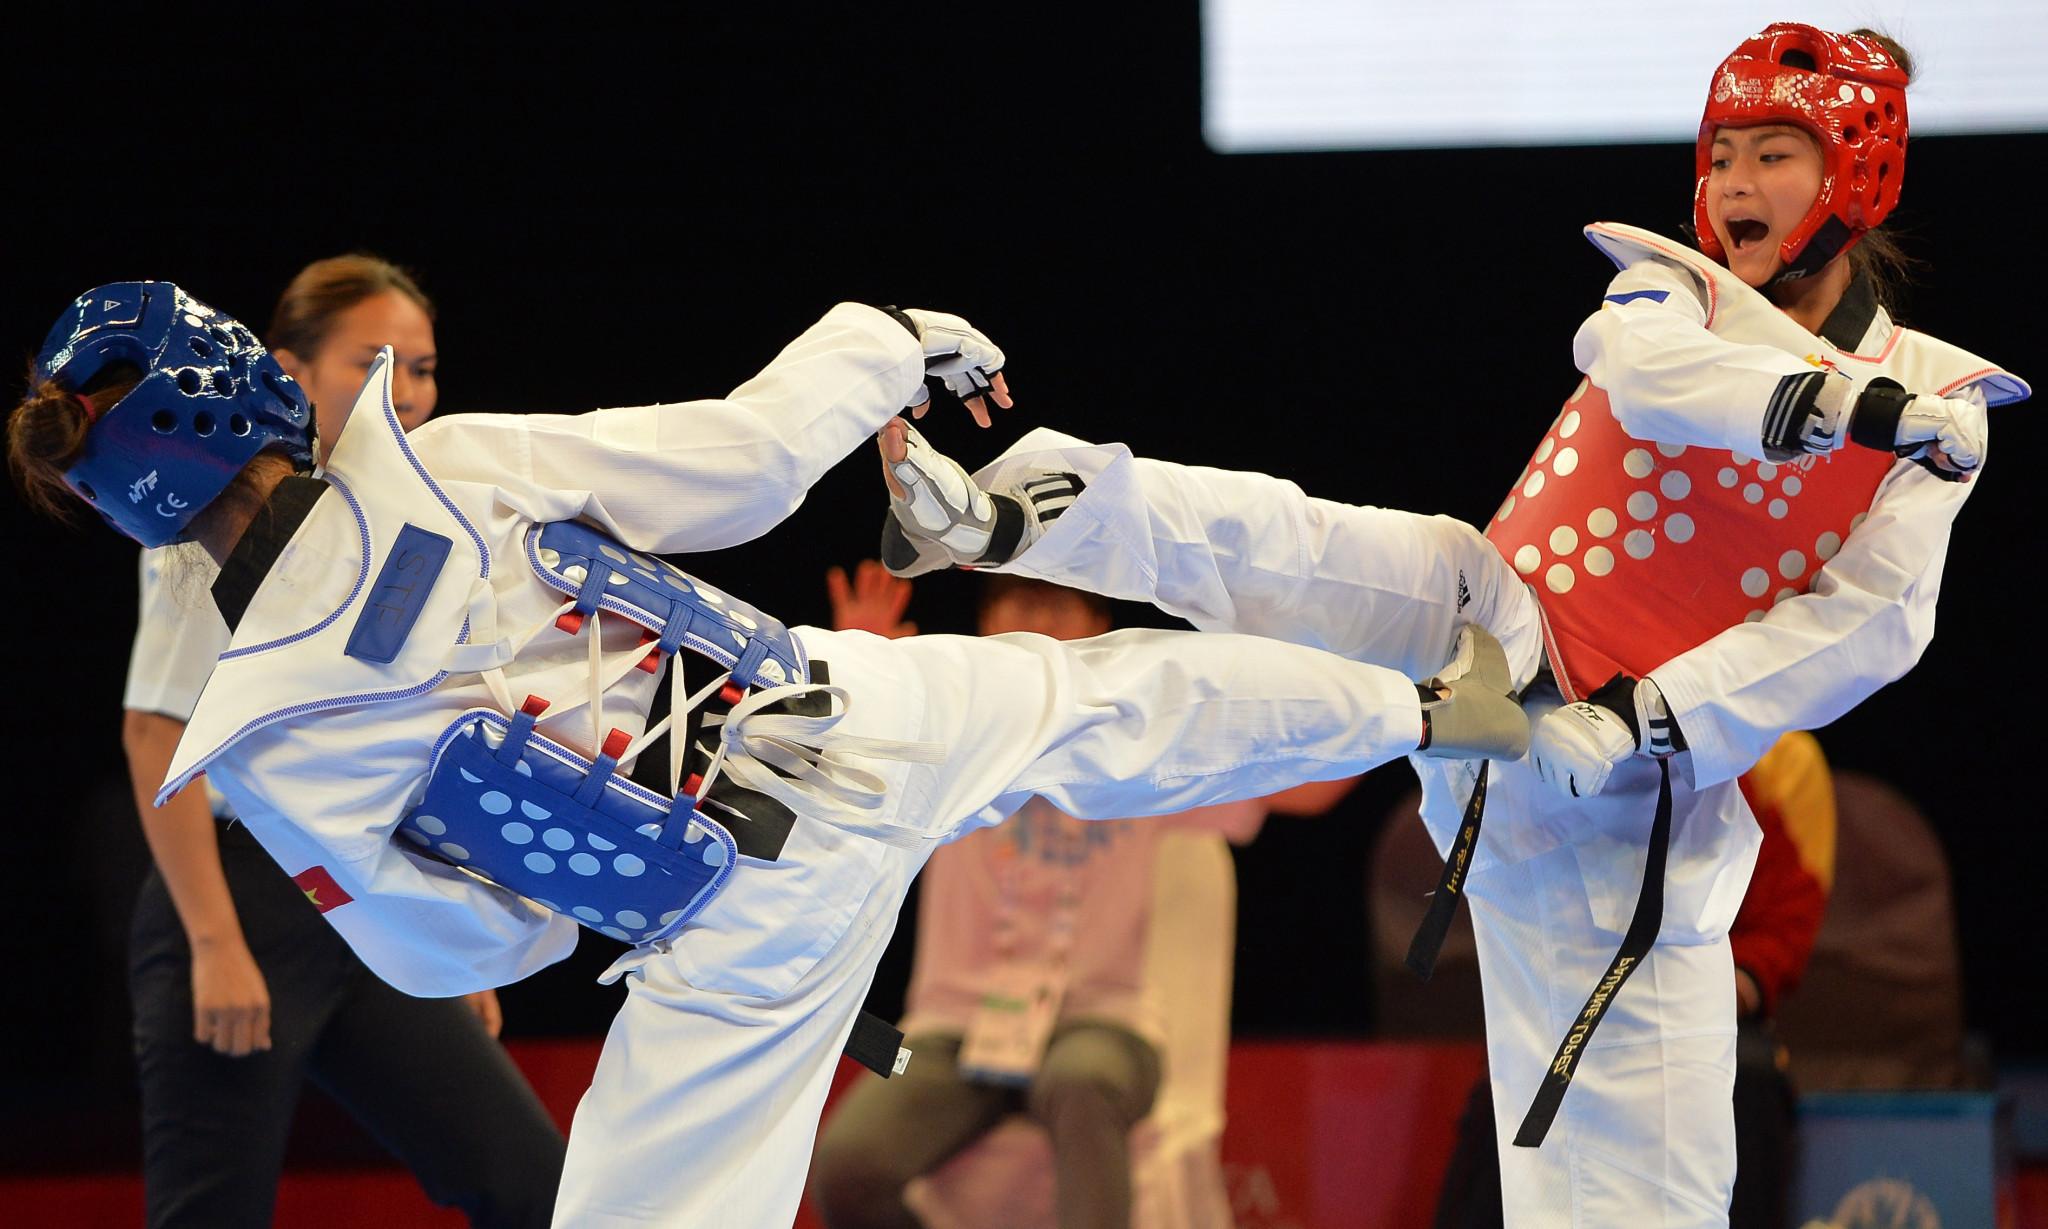 Filipino taekwondo star Lopez part of legacy campaign for children